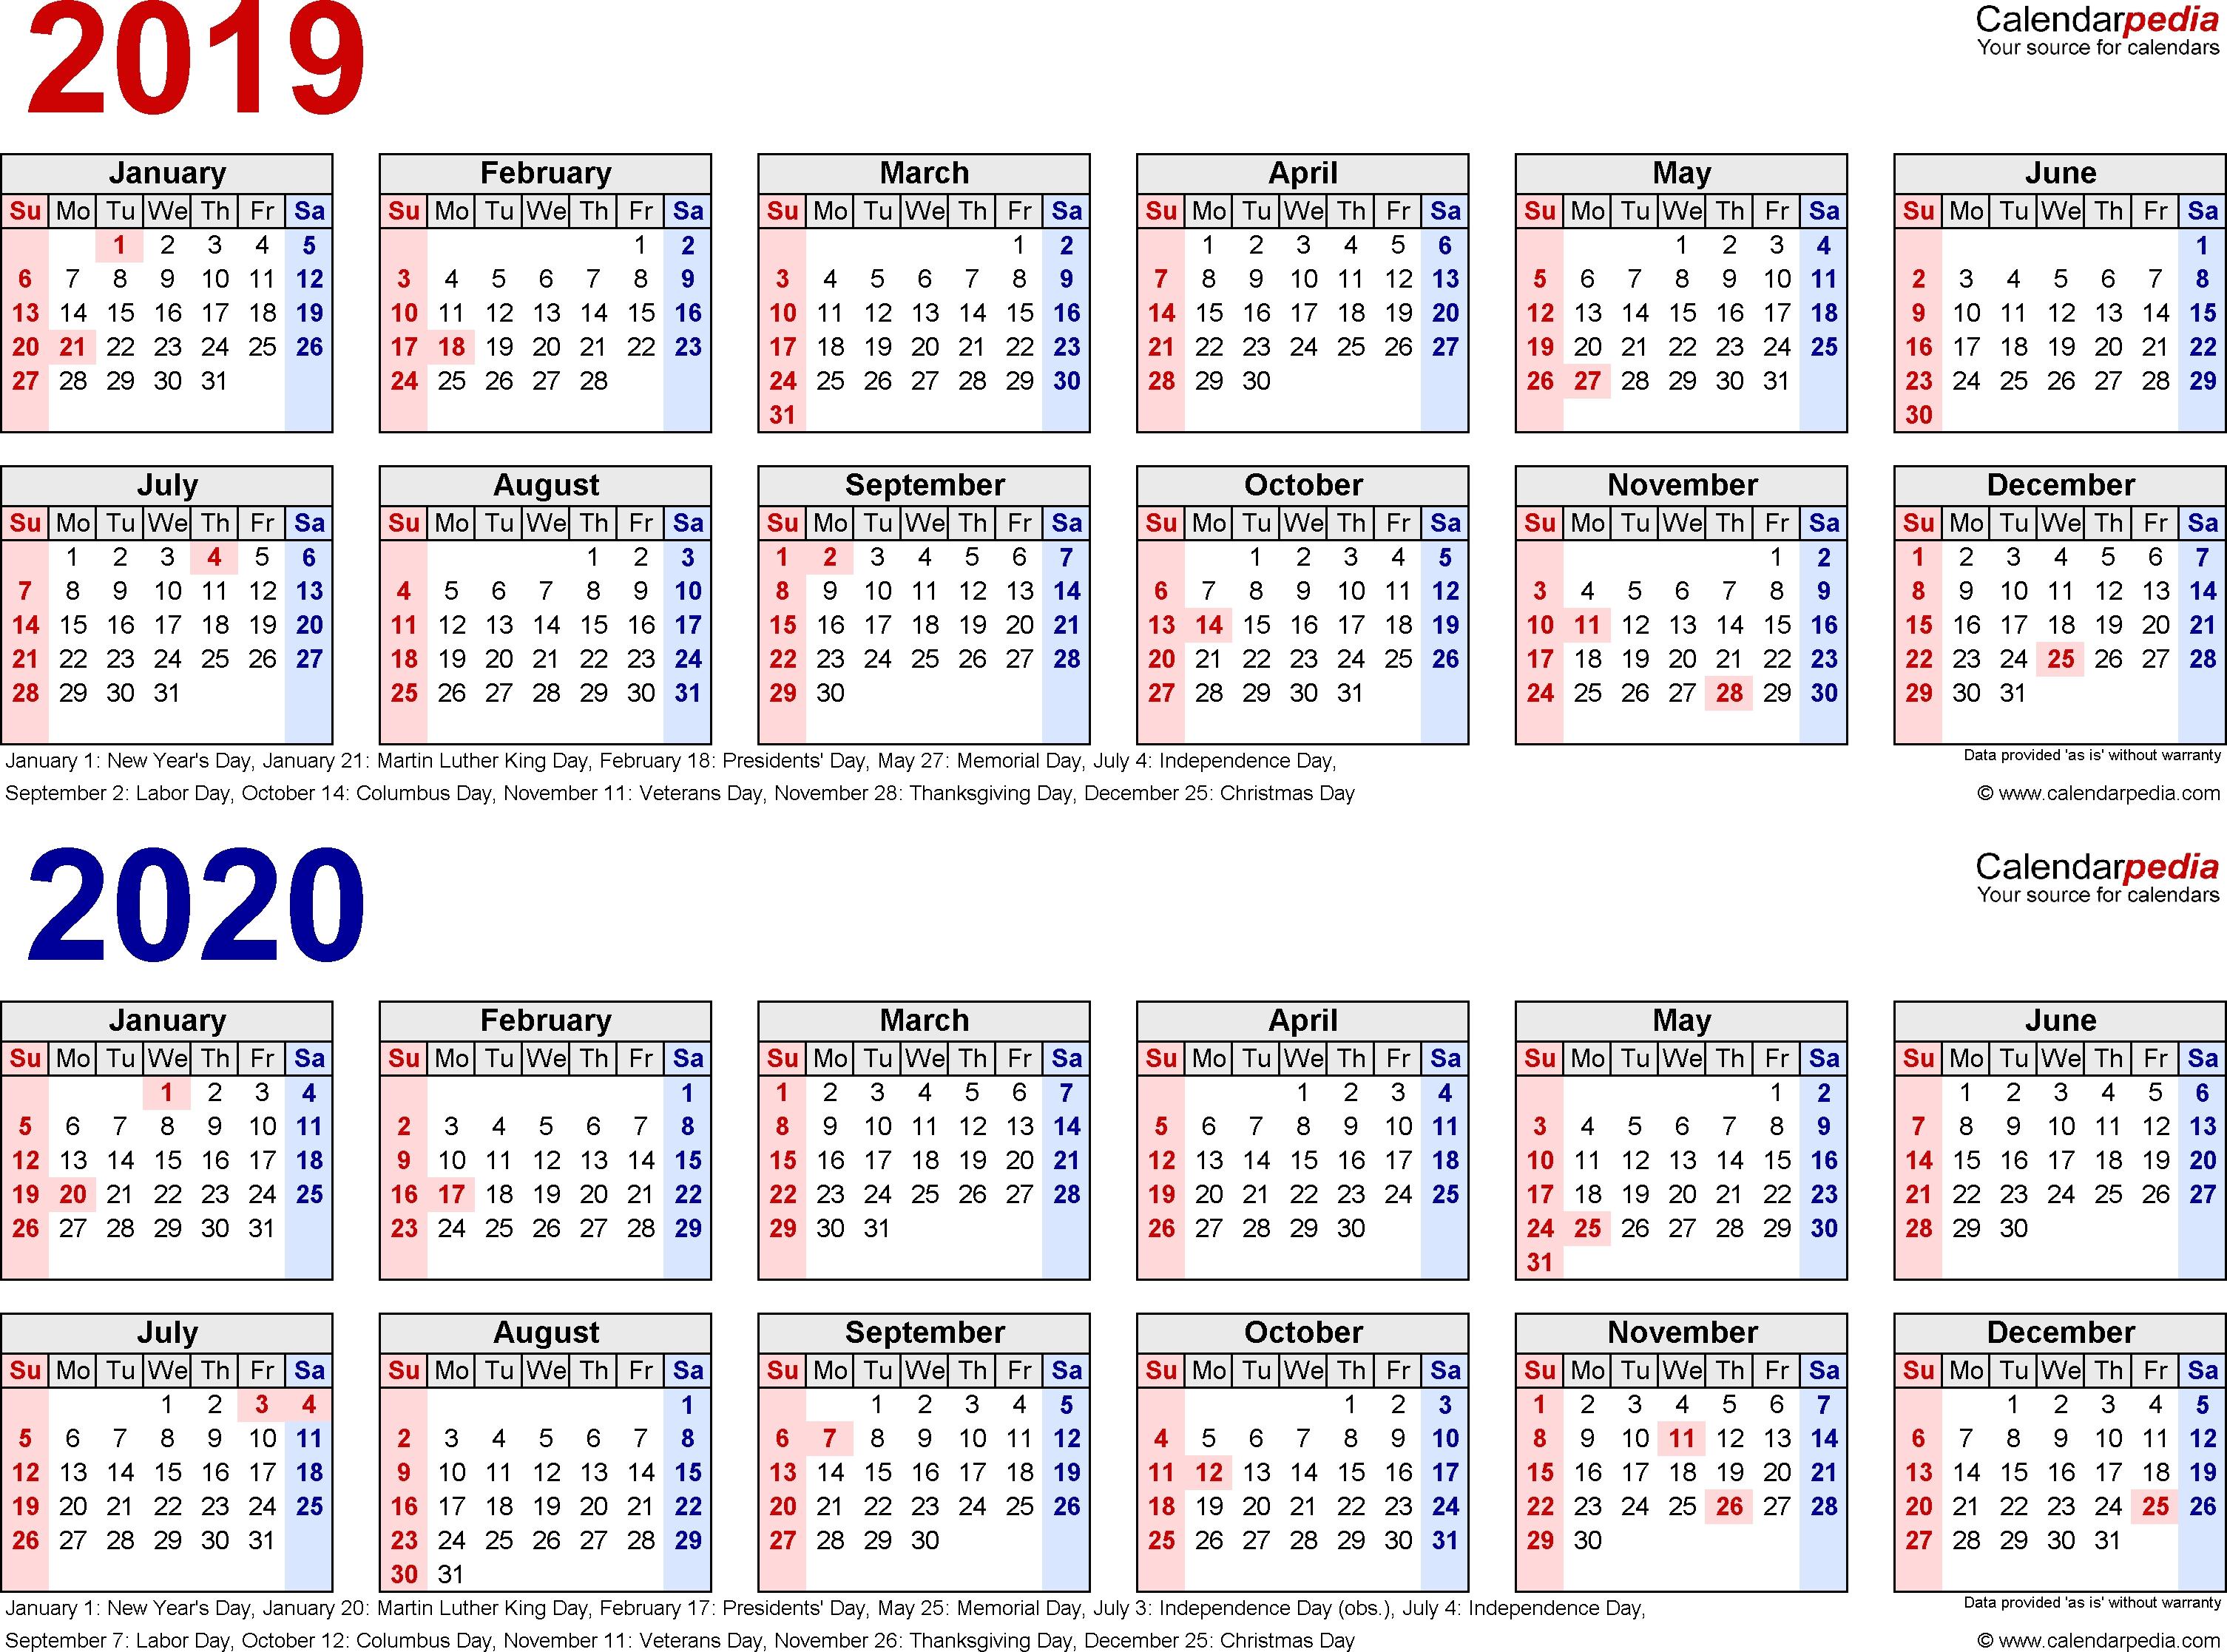 2019-2020 Calendar - Free Printable Two-Year Pdf Calendars pertaining to Printable  Yearly Calendar June 2019-2020